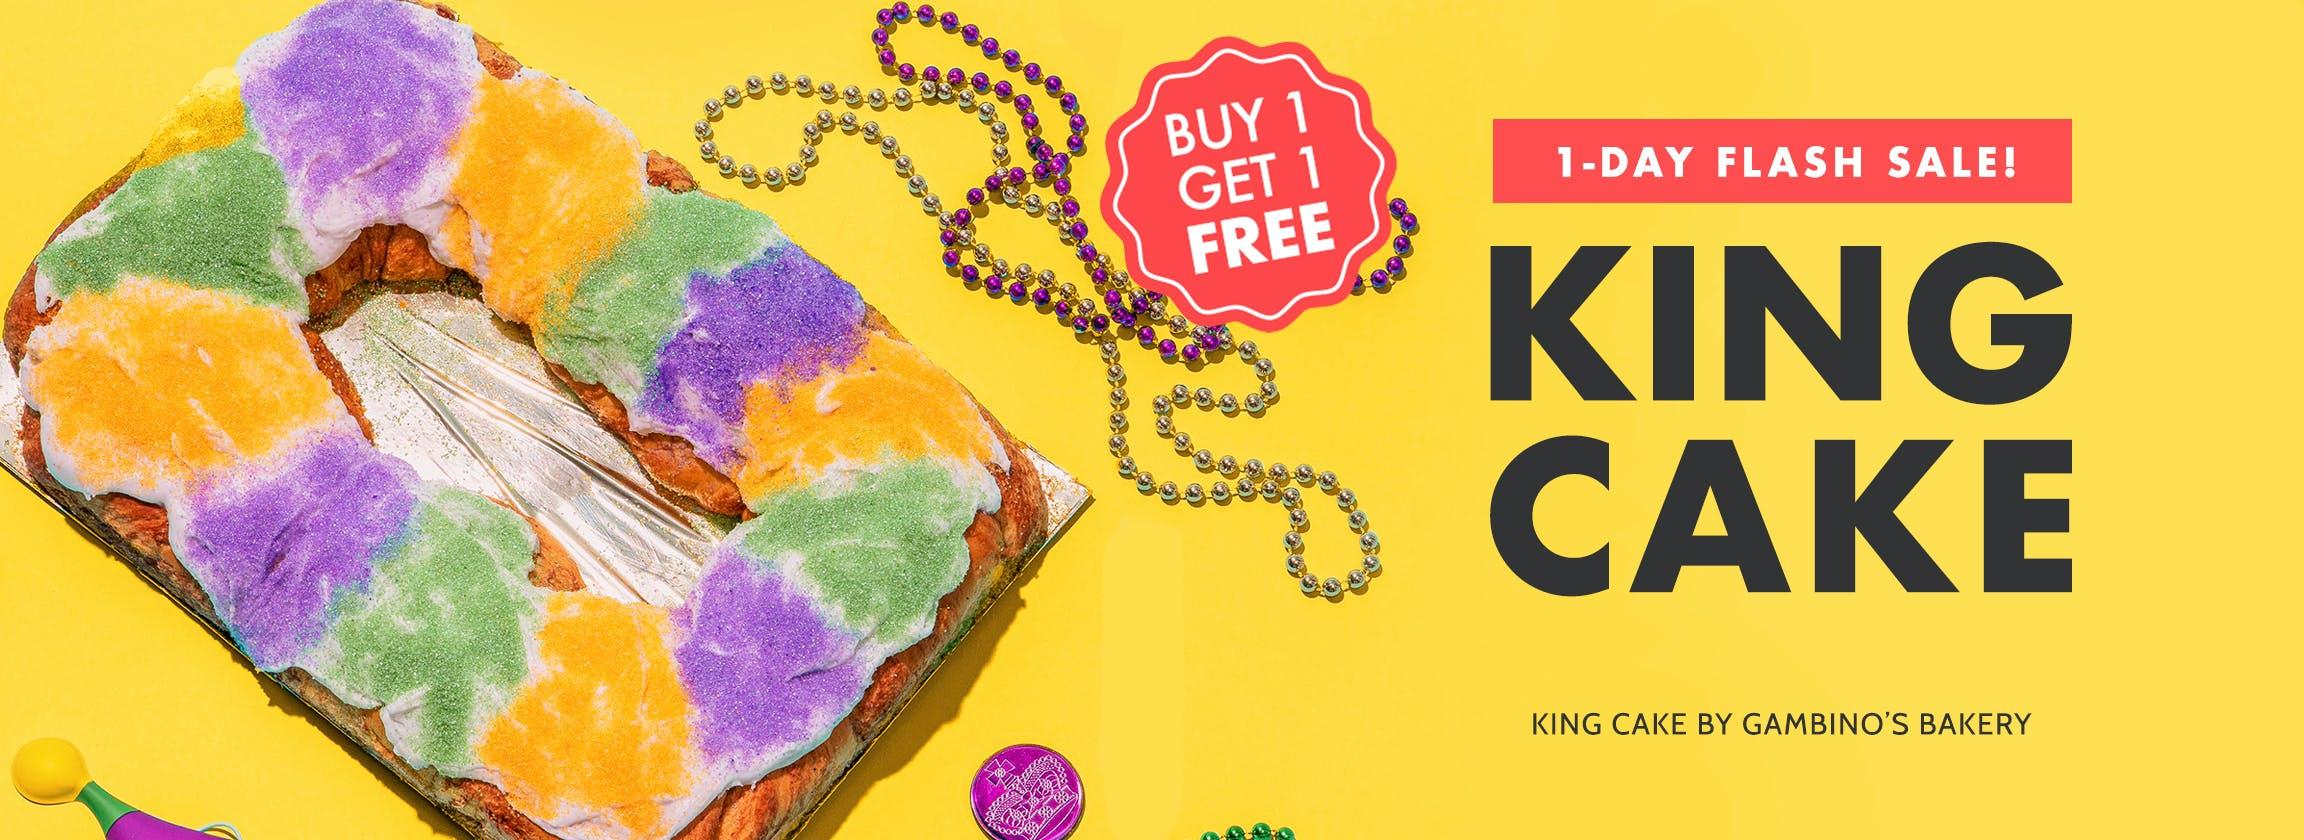 Mardi Gras King Cake BOGO